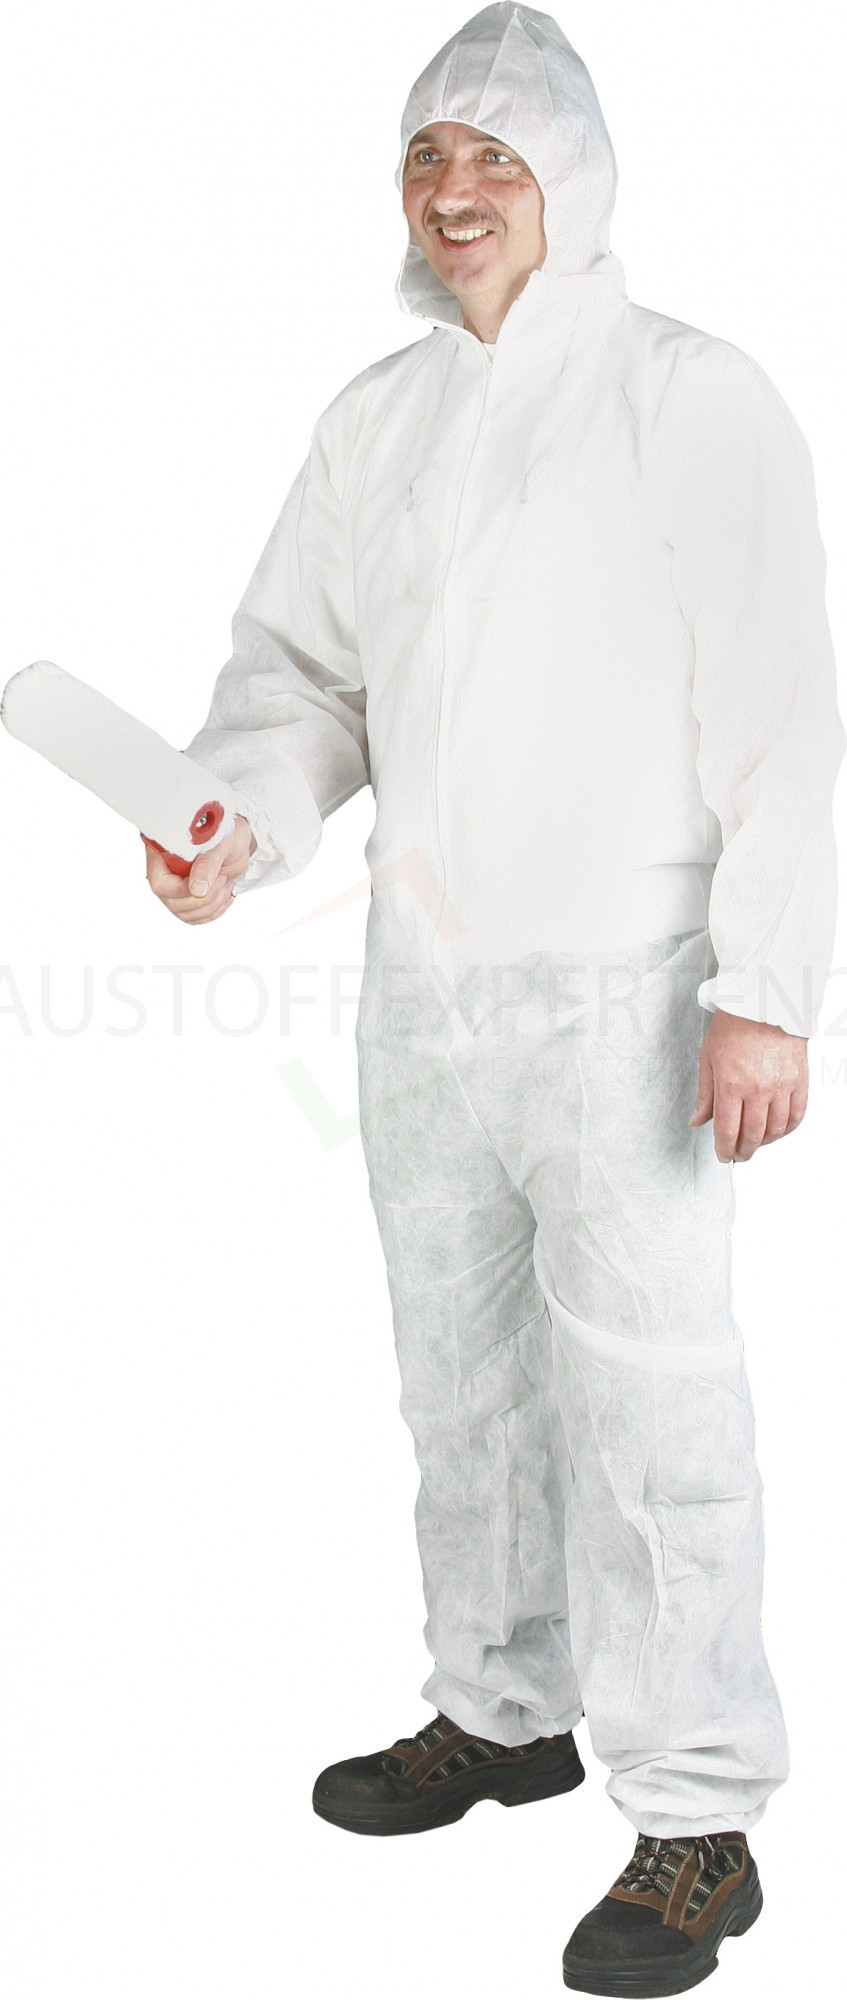 Schutzoverall aus Polypropylen, weiß